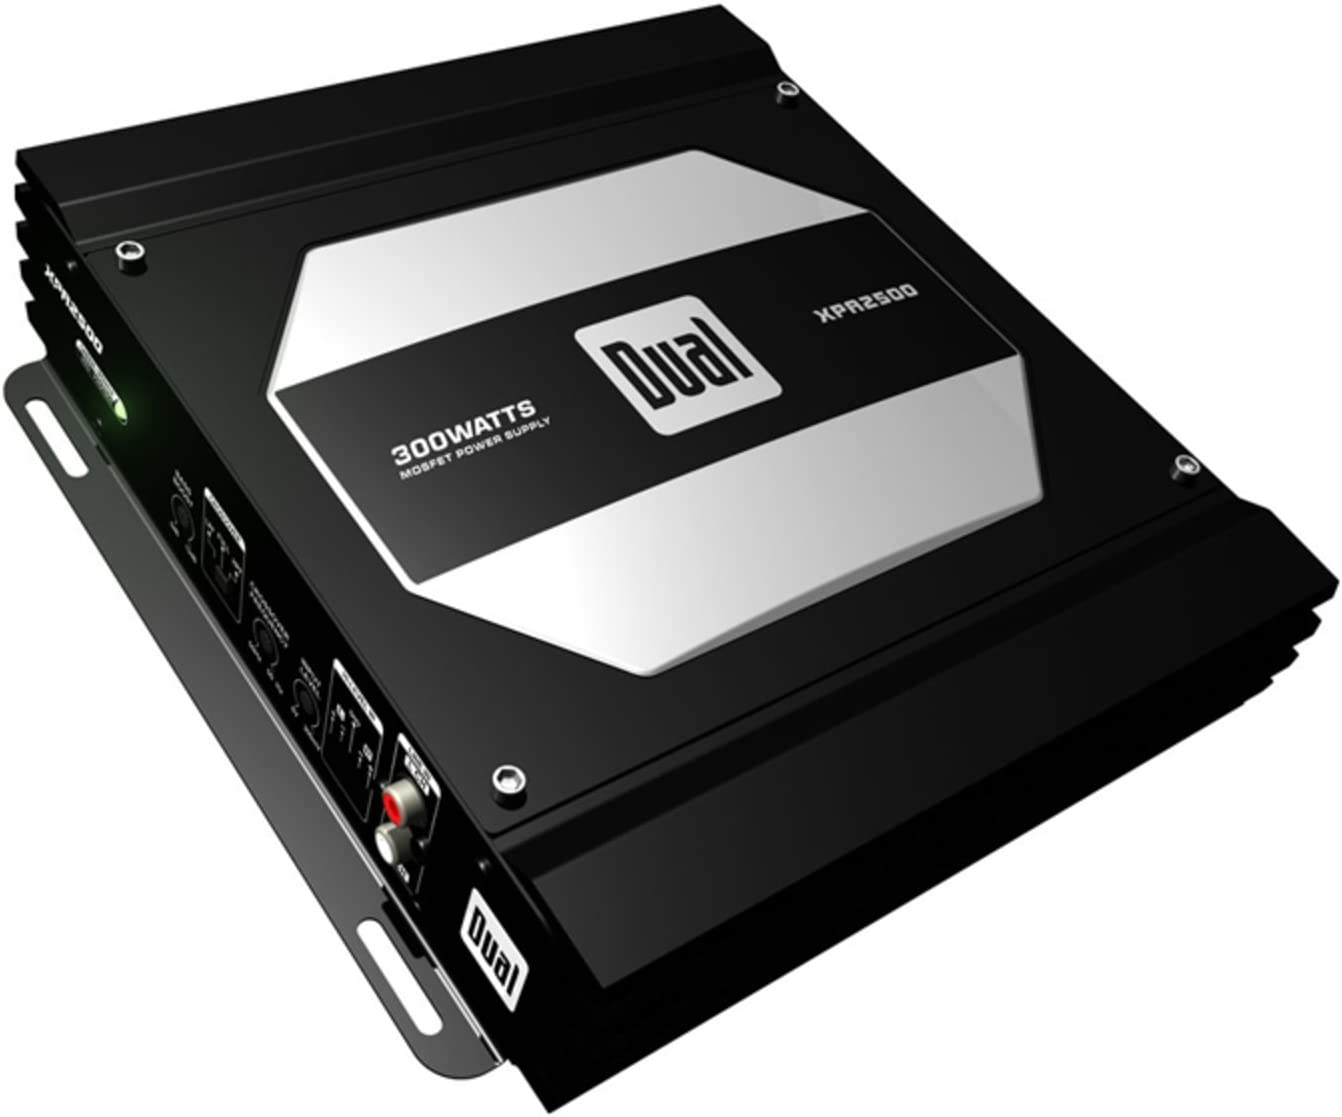 Dual Electronics XPA2500 2//1 High Performance Power MOSFET Class A//B Car Amplifier with 300-Watts Dynamic Peak Power